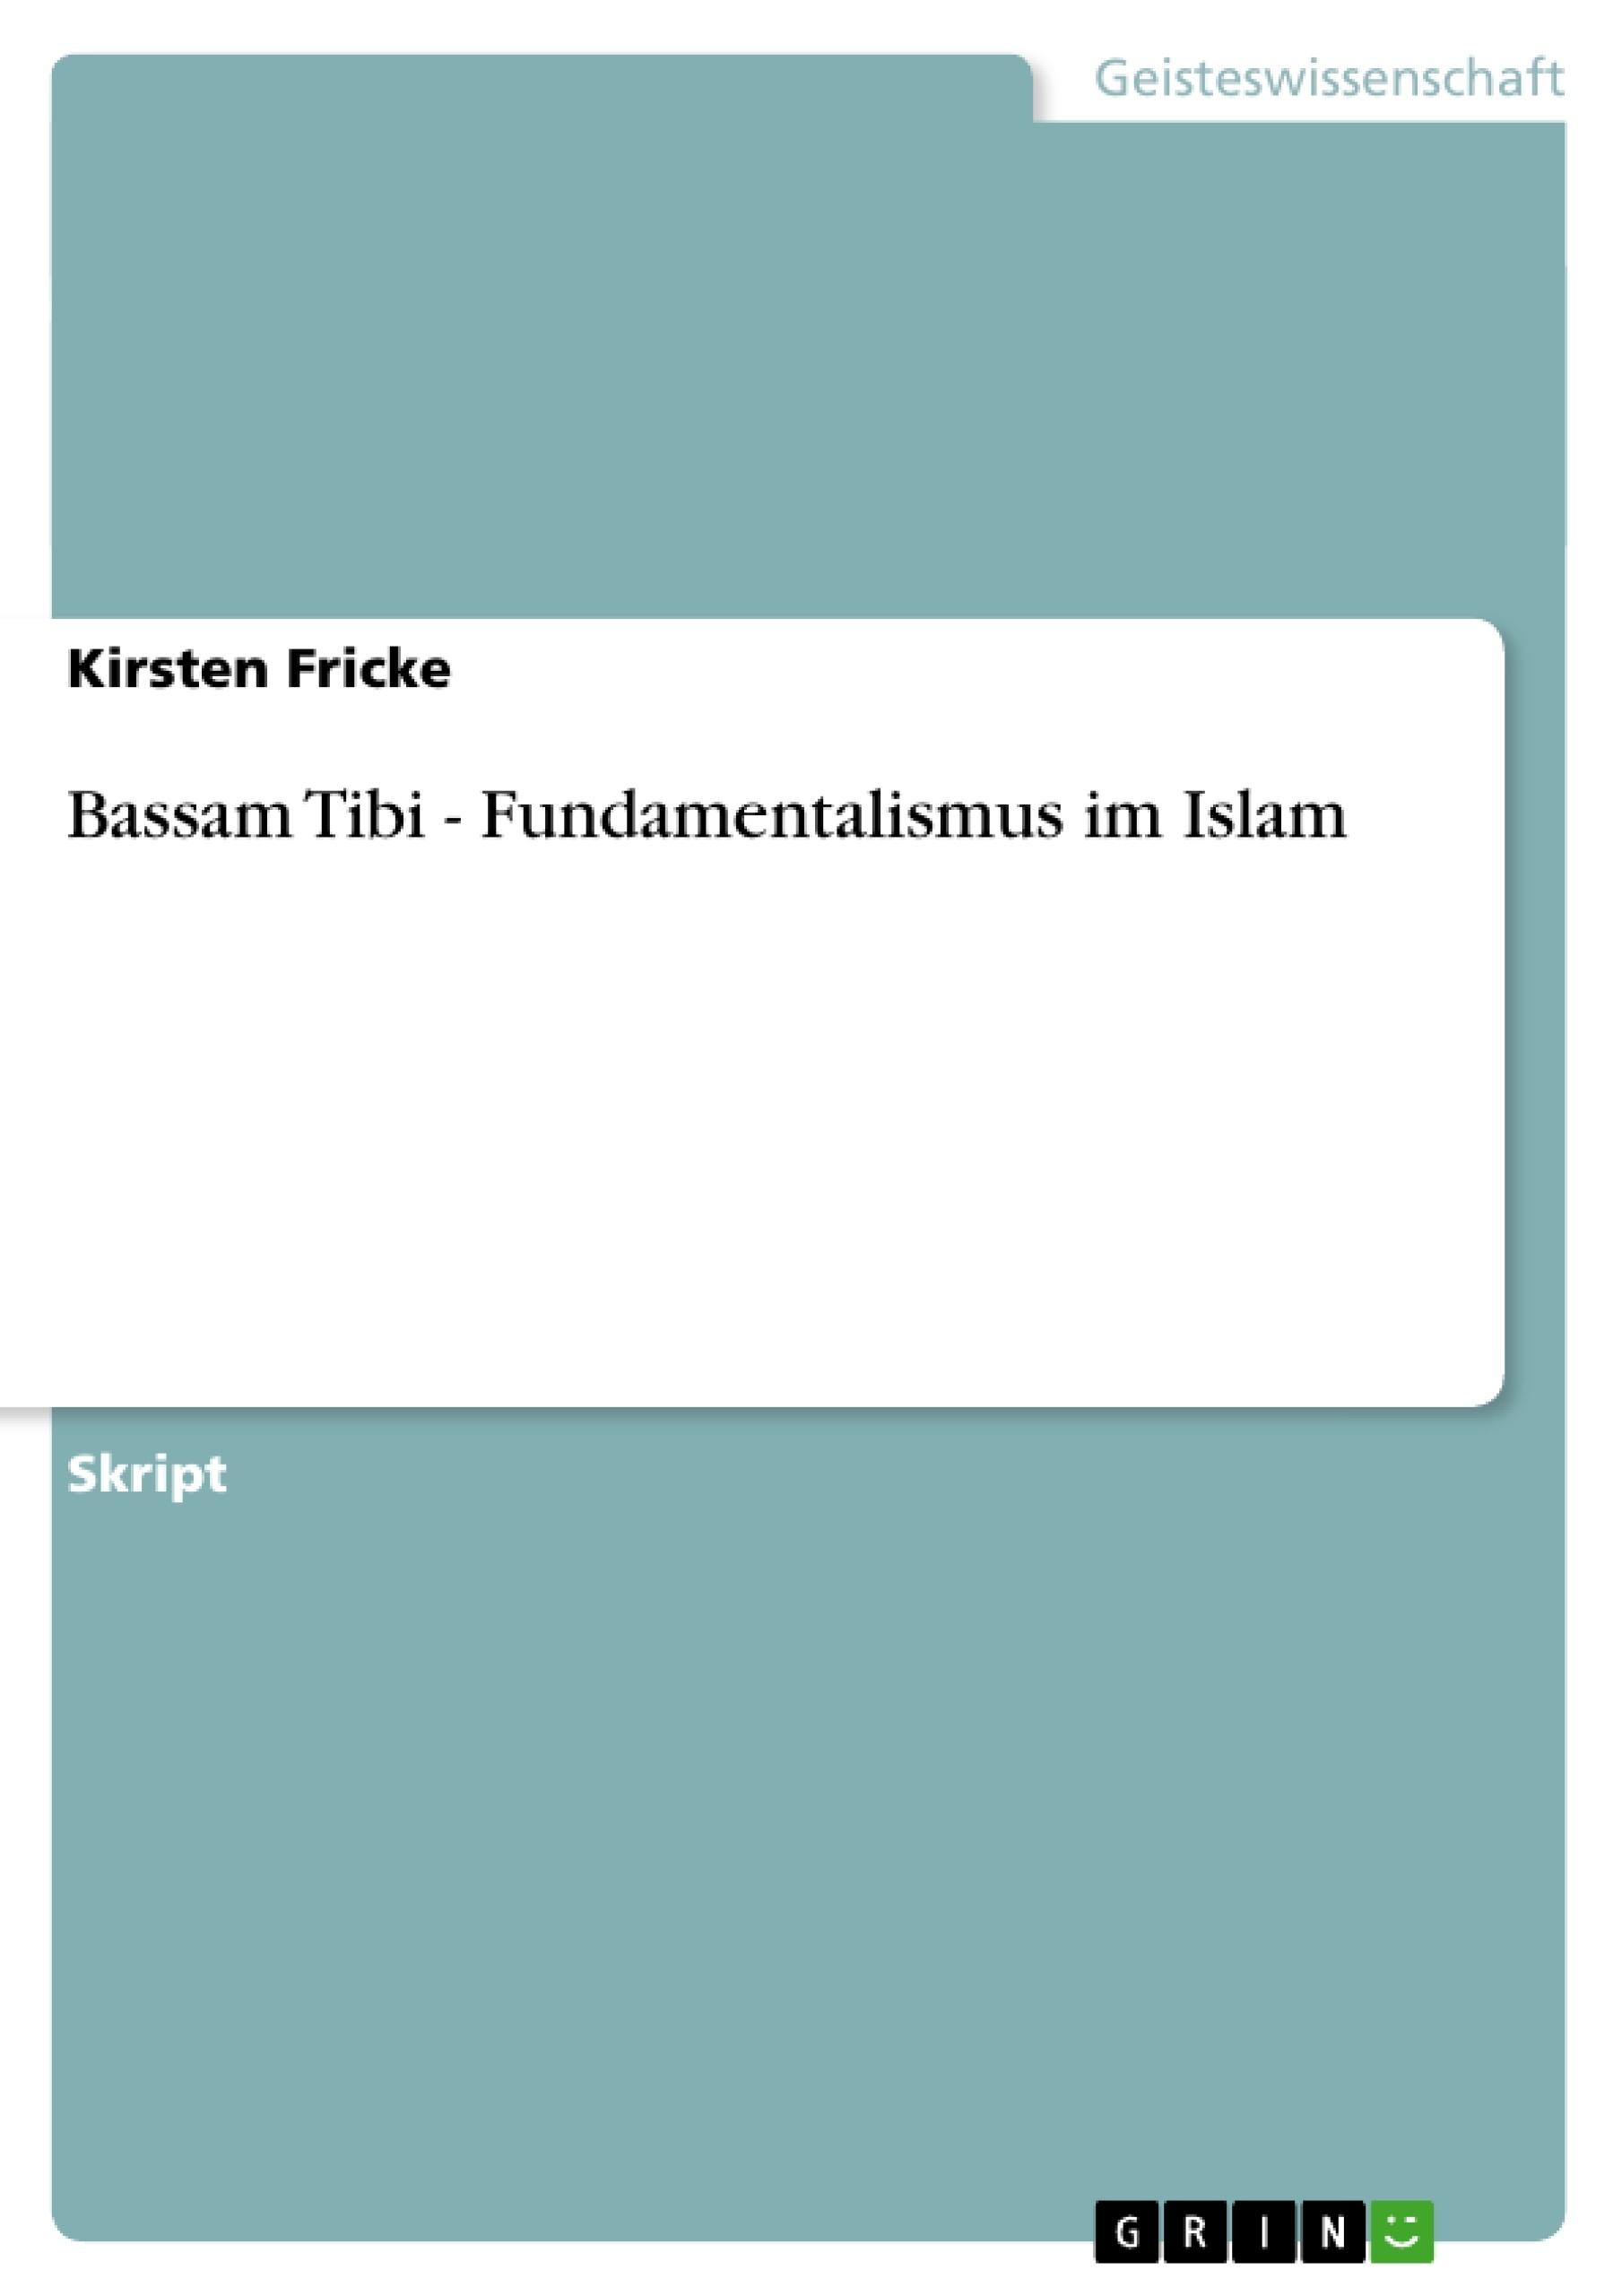 Titel: Bassam Tibi - Fundamentalismus im Islam